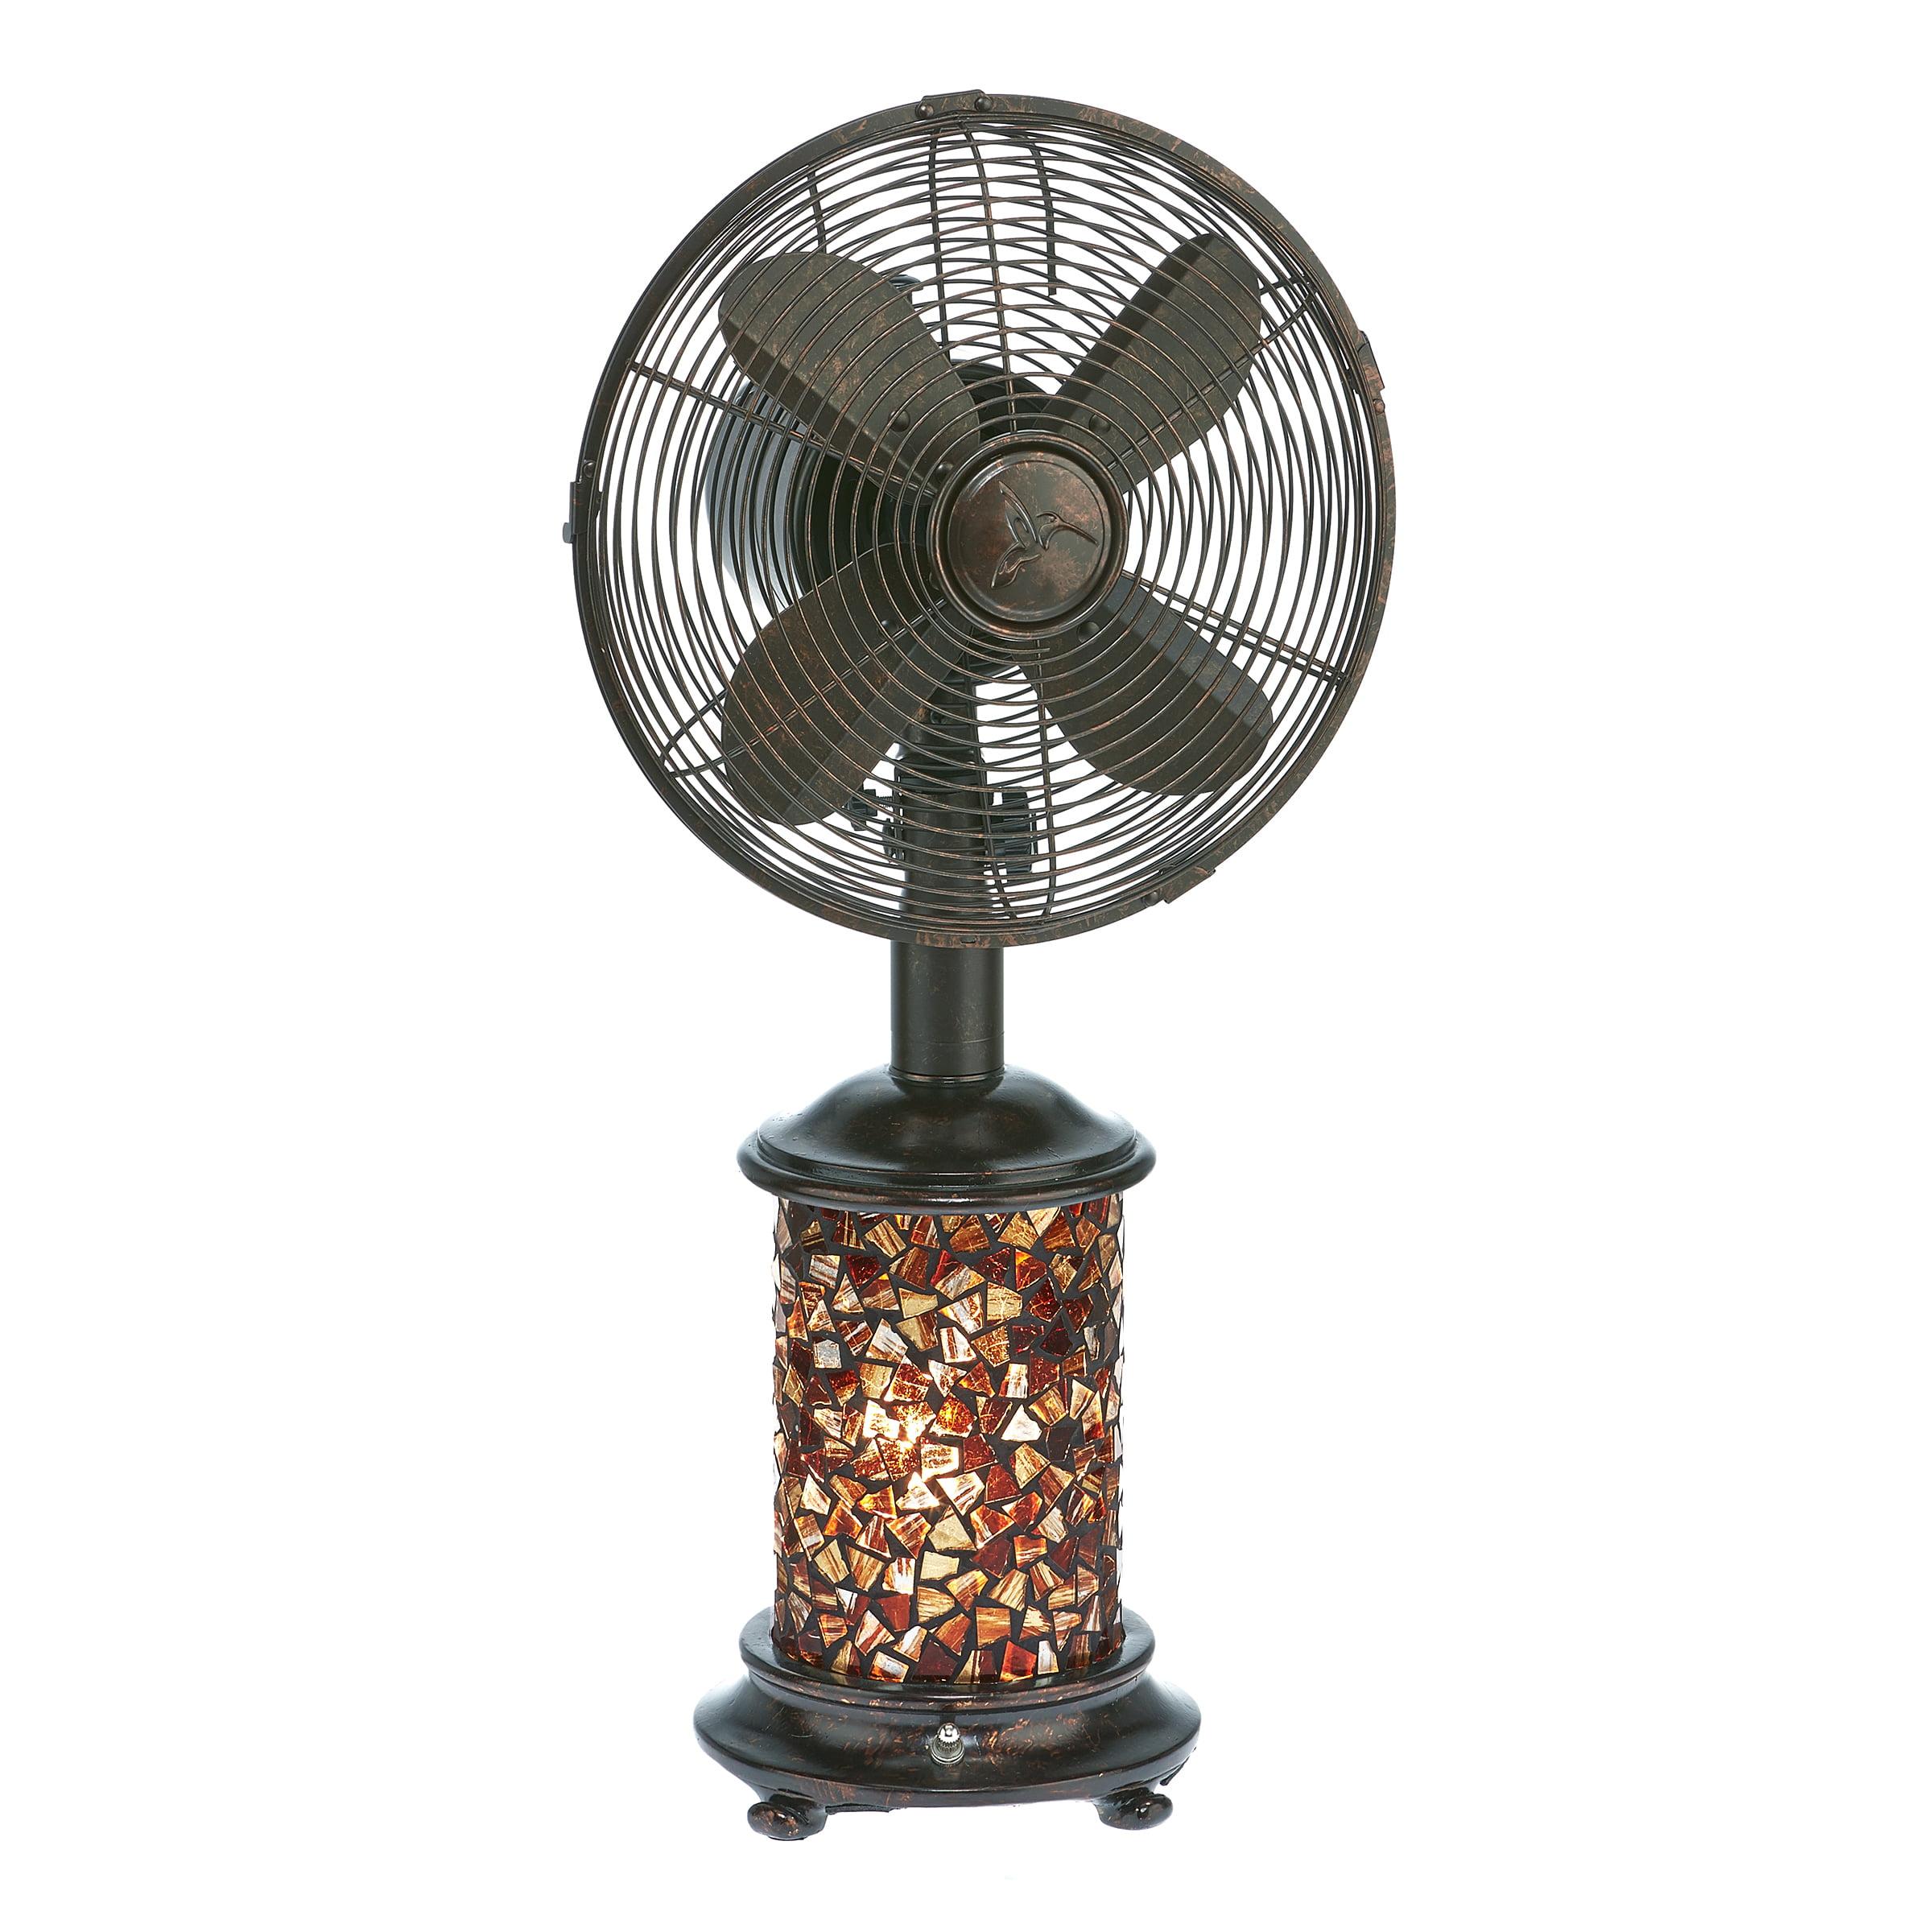 DecoBREEZE Oscillating Table Fan and Tiffany Style Table Lamp, 3-Speed Circulator Fan, 10-Inch, Metropolitan